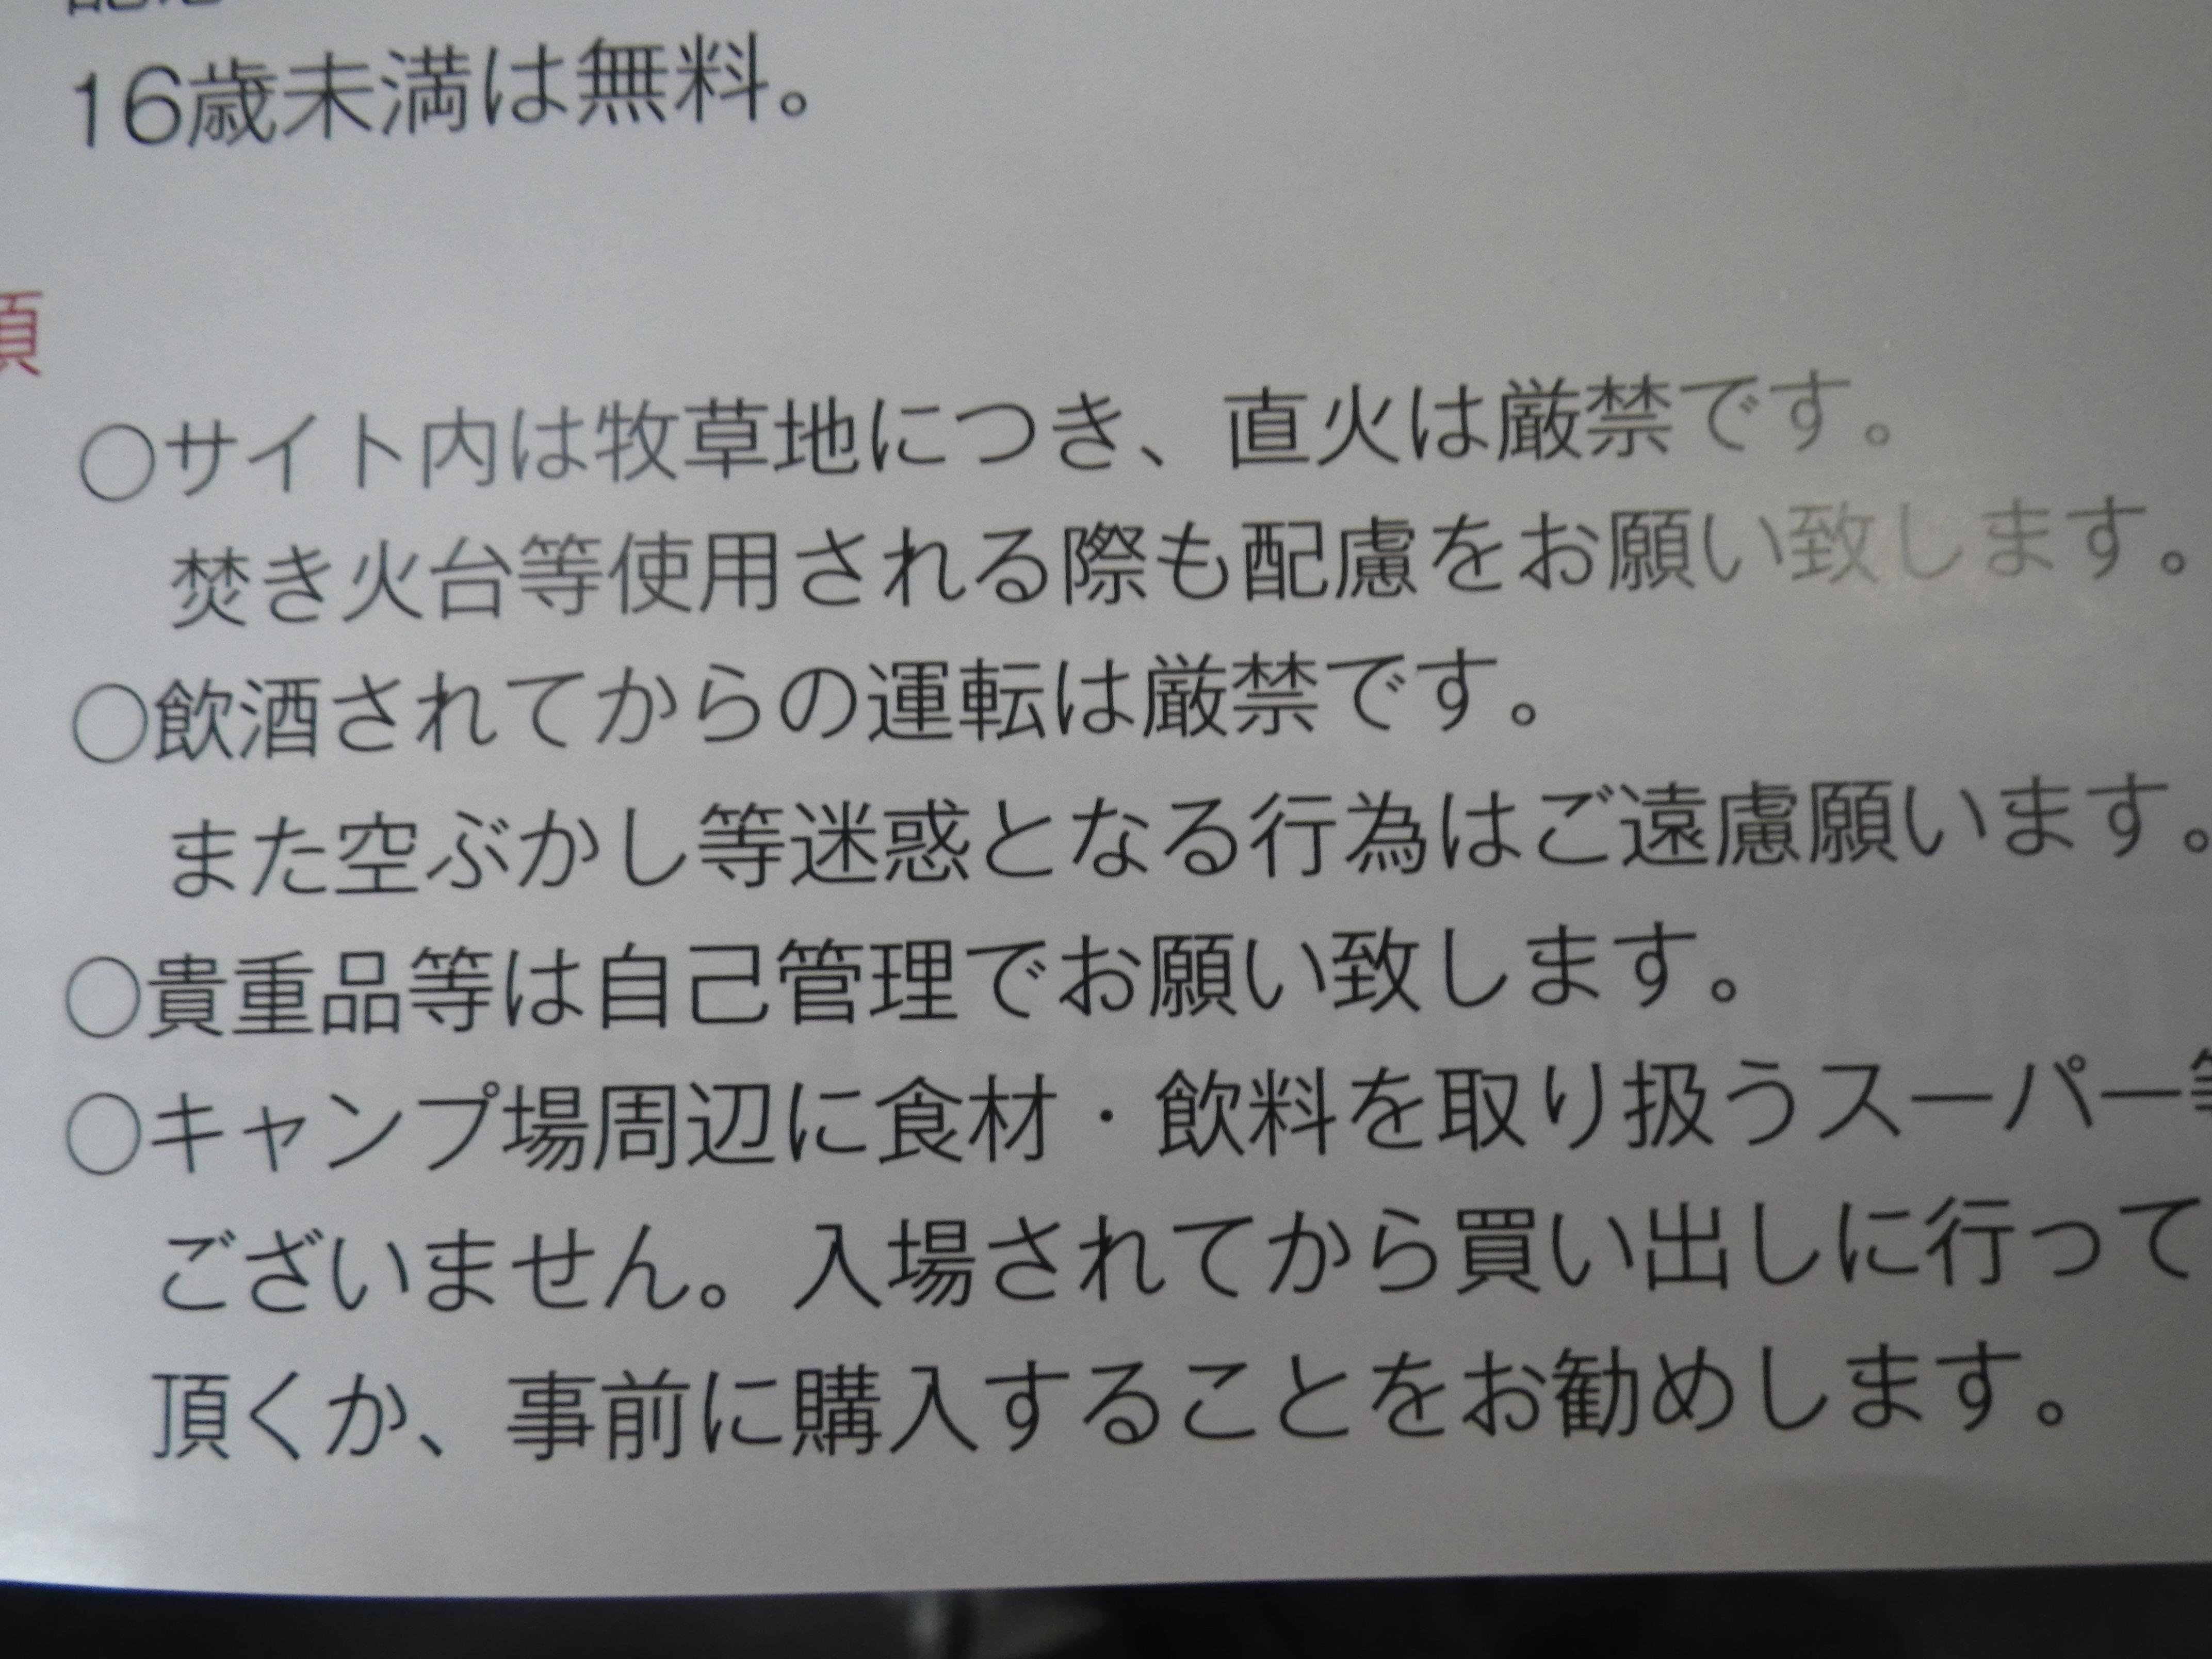 RIMG47.jpg